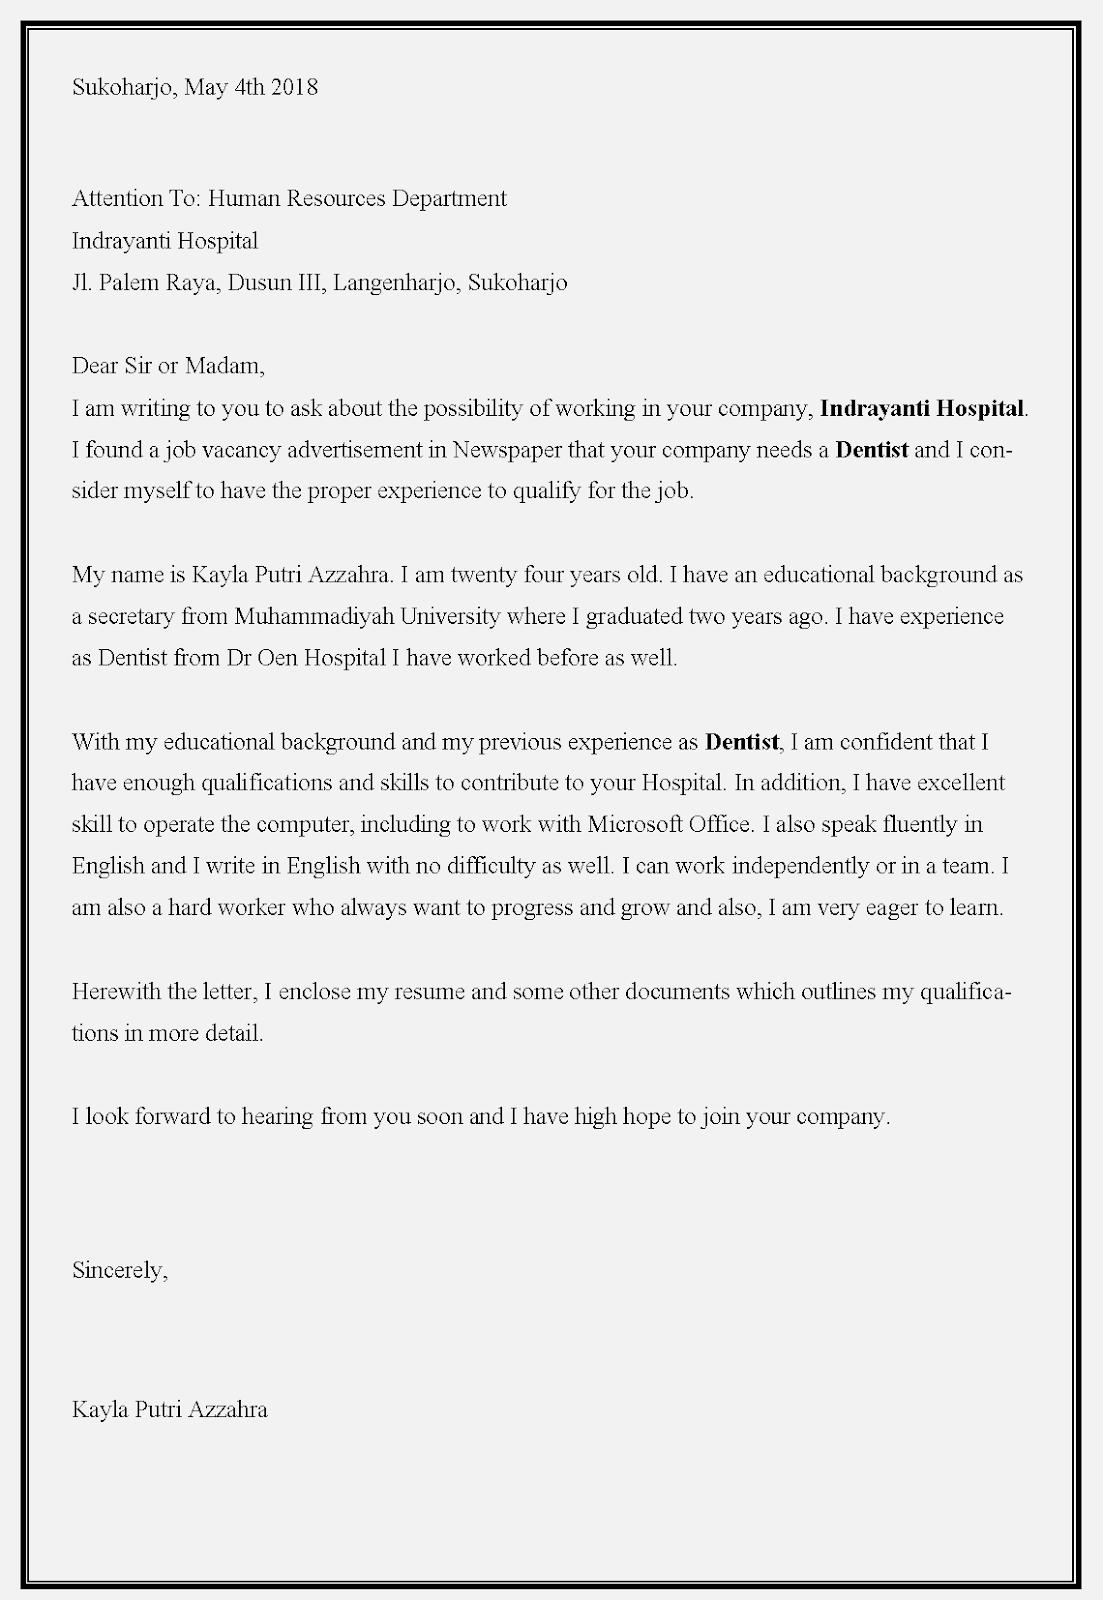 Contoh surat lamaran kerja dokter umum  utuk melamar di rumah sakit Indrayanti solo baru